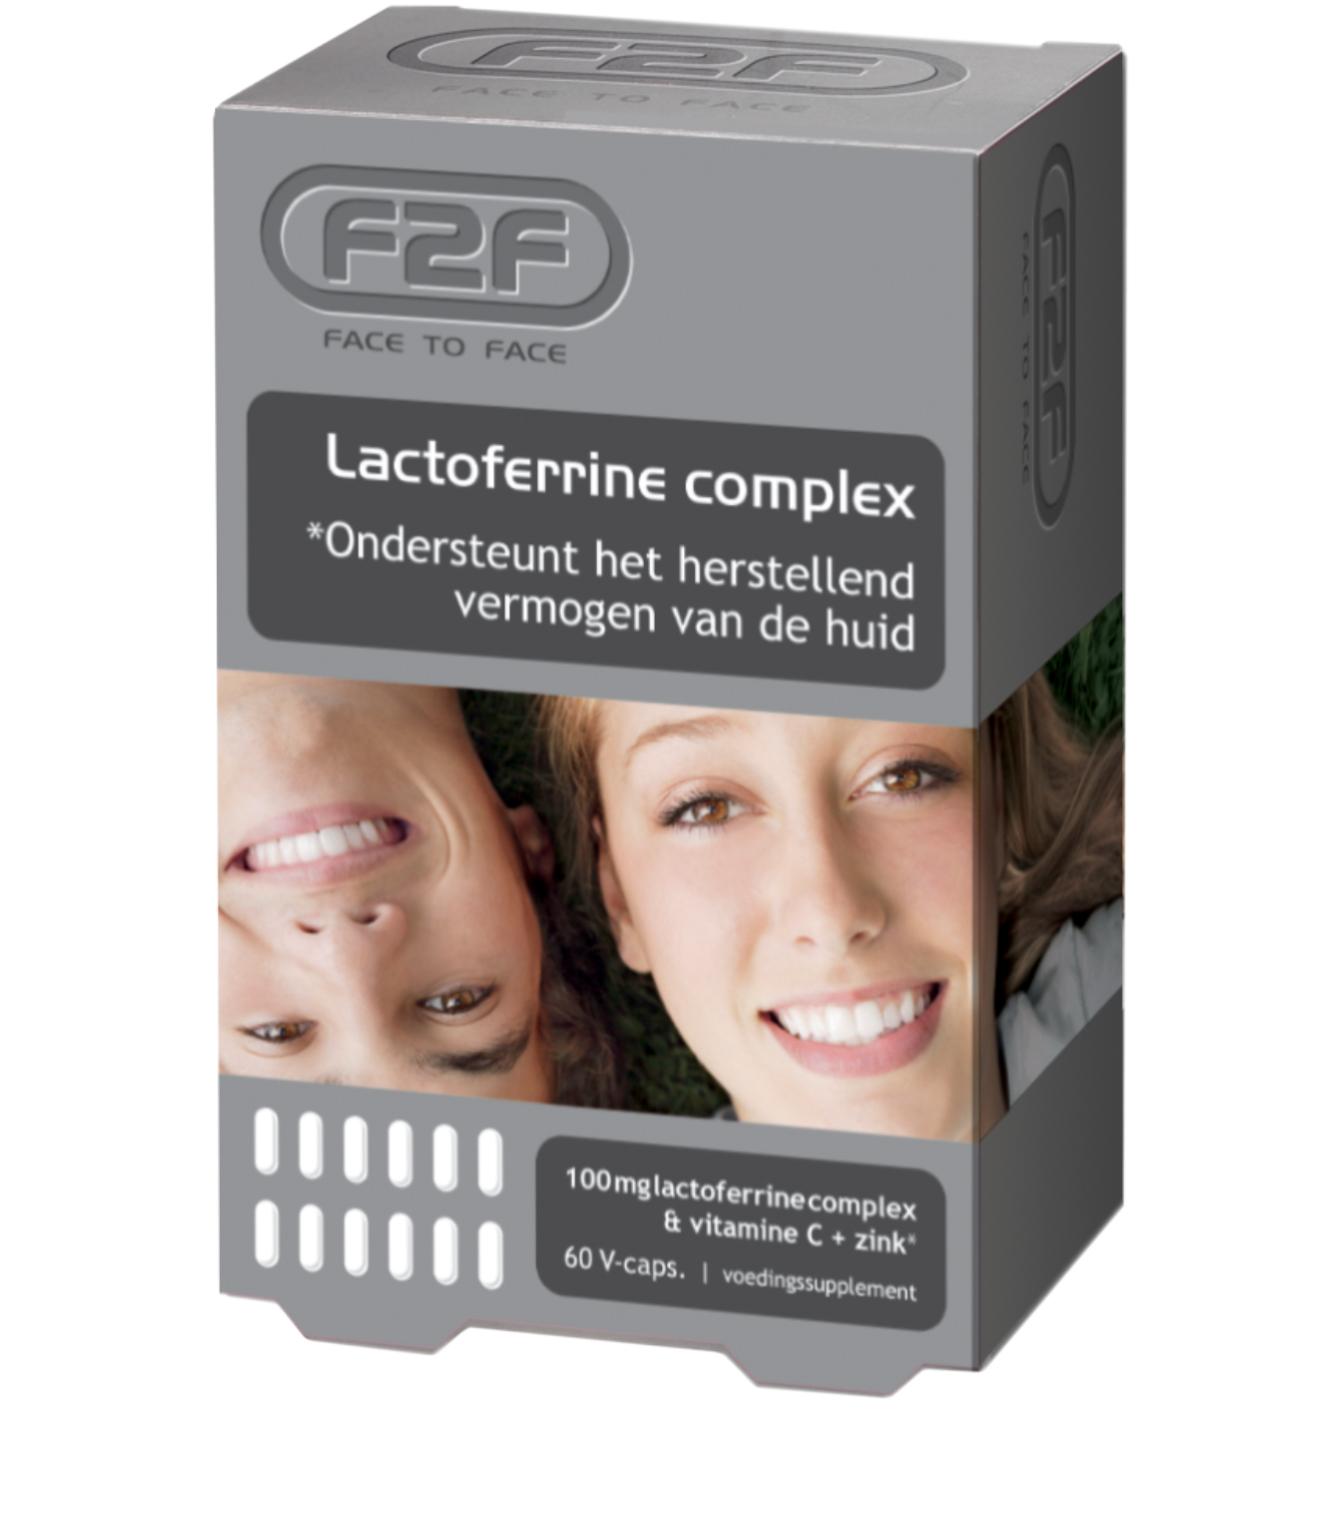 Face2Face f2f - Lactoferrine complex - 60 V-capsules